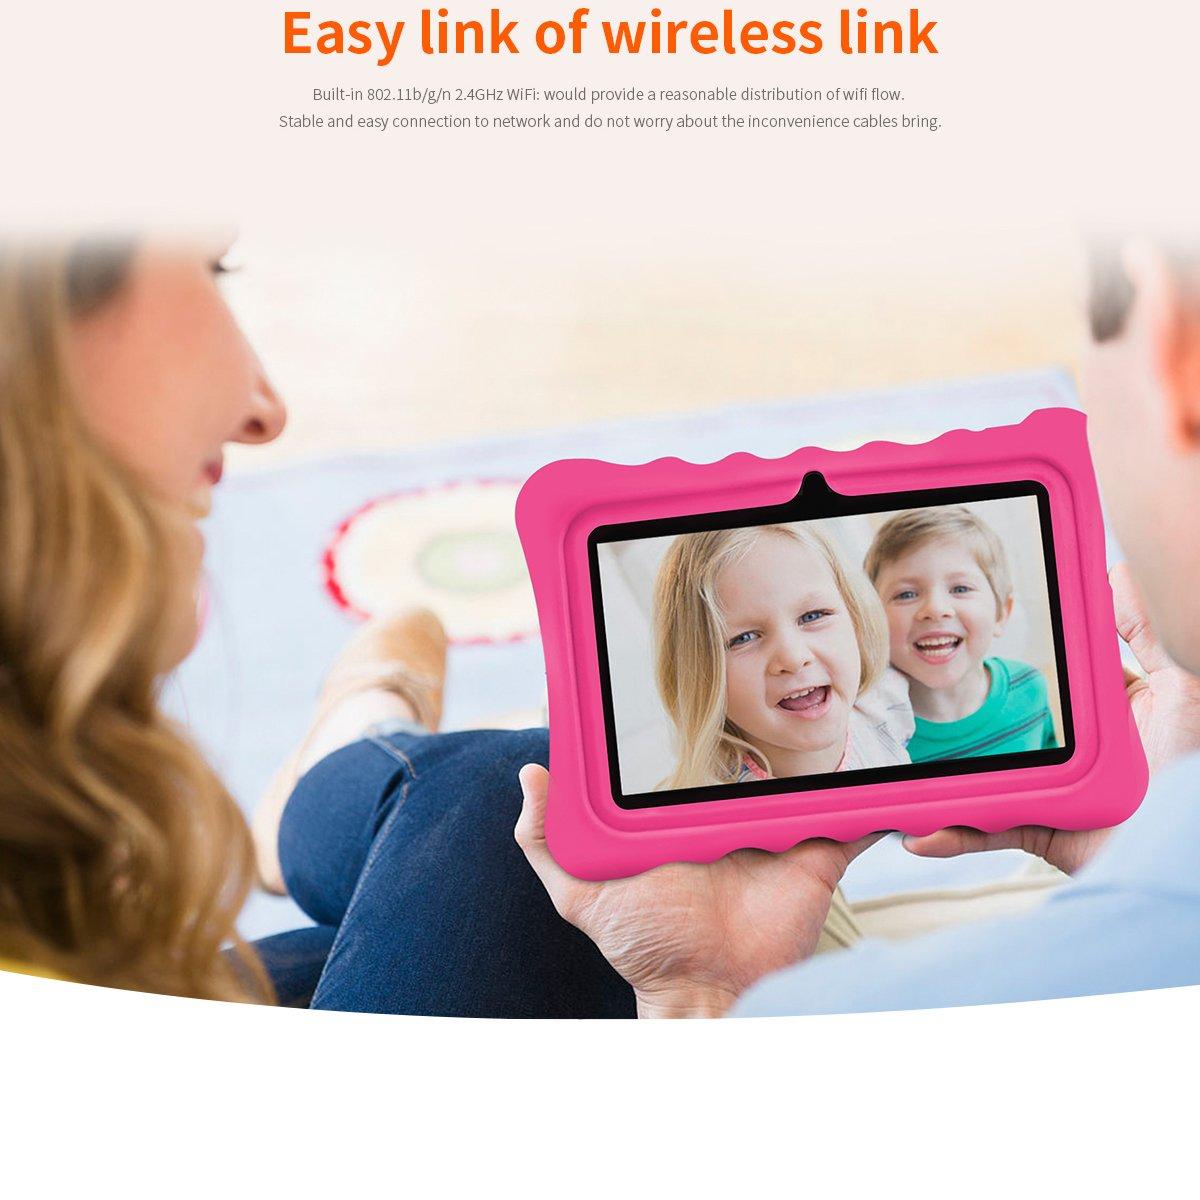 Ainol Q88 Android 7.1 RK3126C Quad Core 1GB+16GB 0.3MP+0.3MP Cam WiFi 2800Ah Tablet PC--Pink by Ainol Q88 (Image #3)